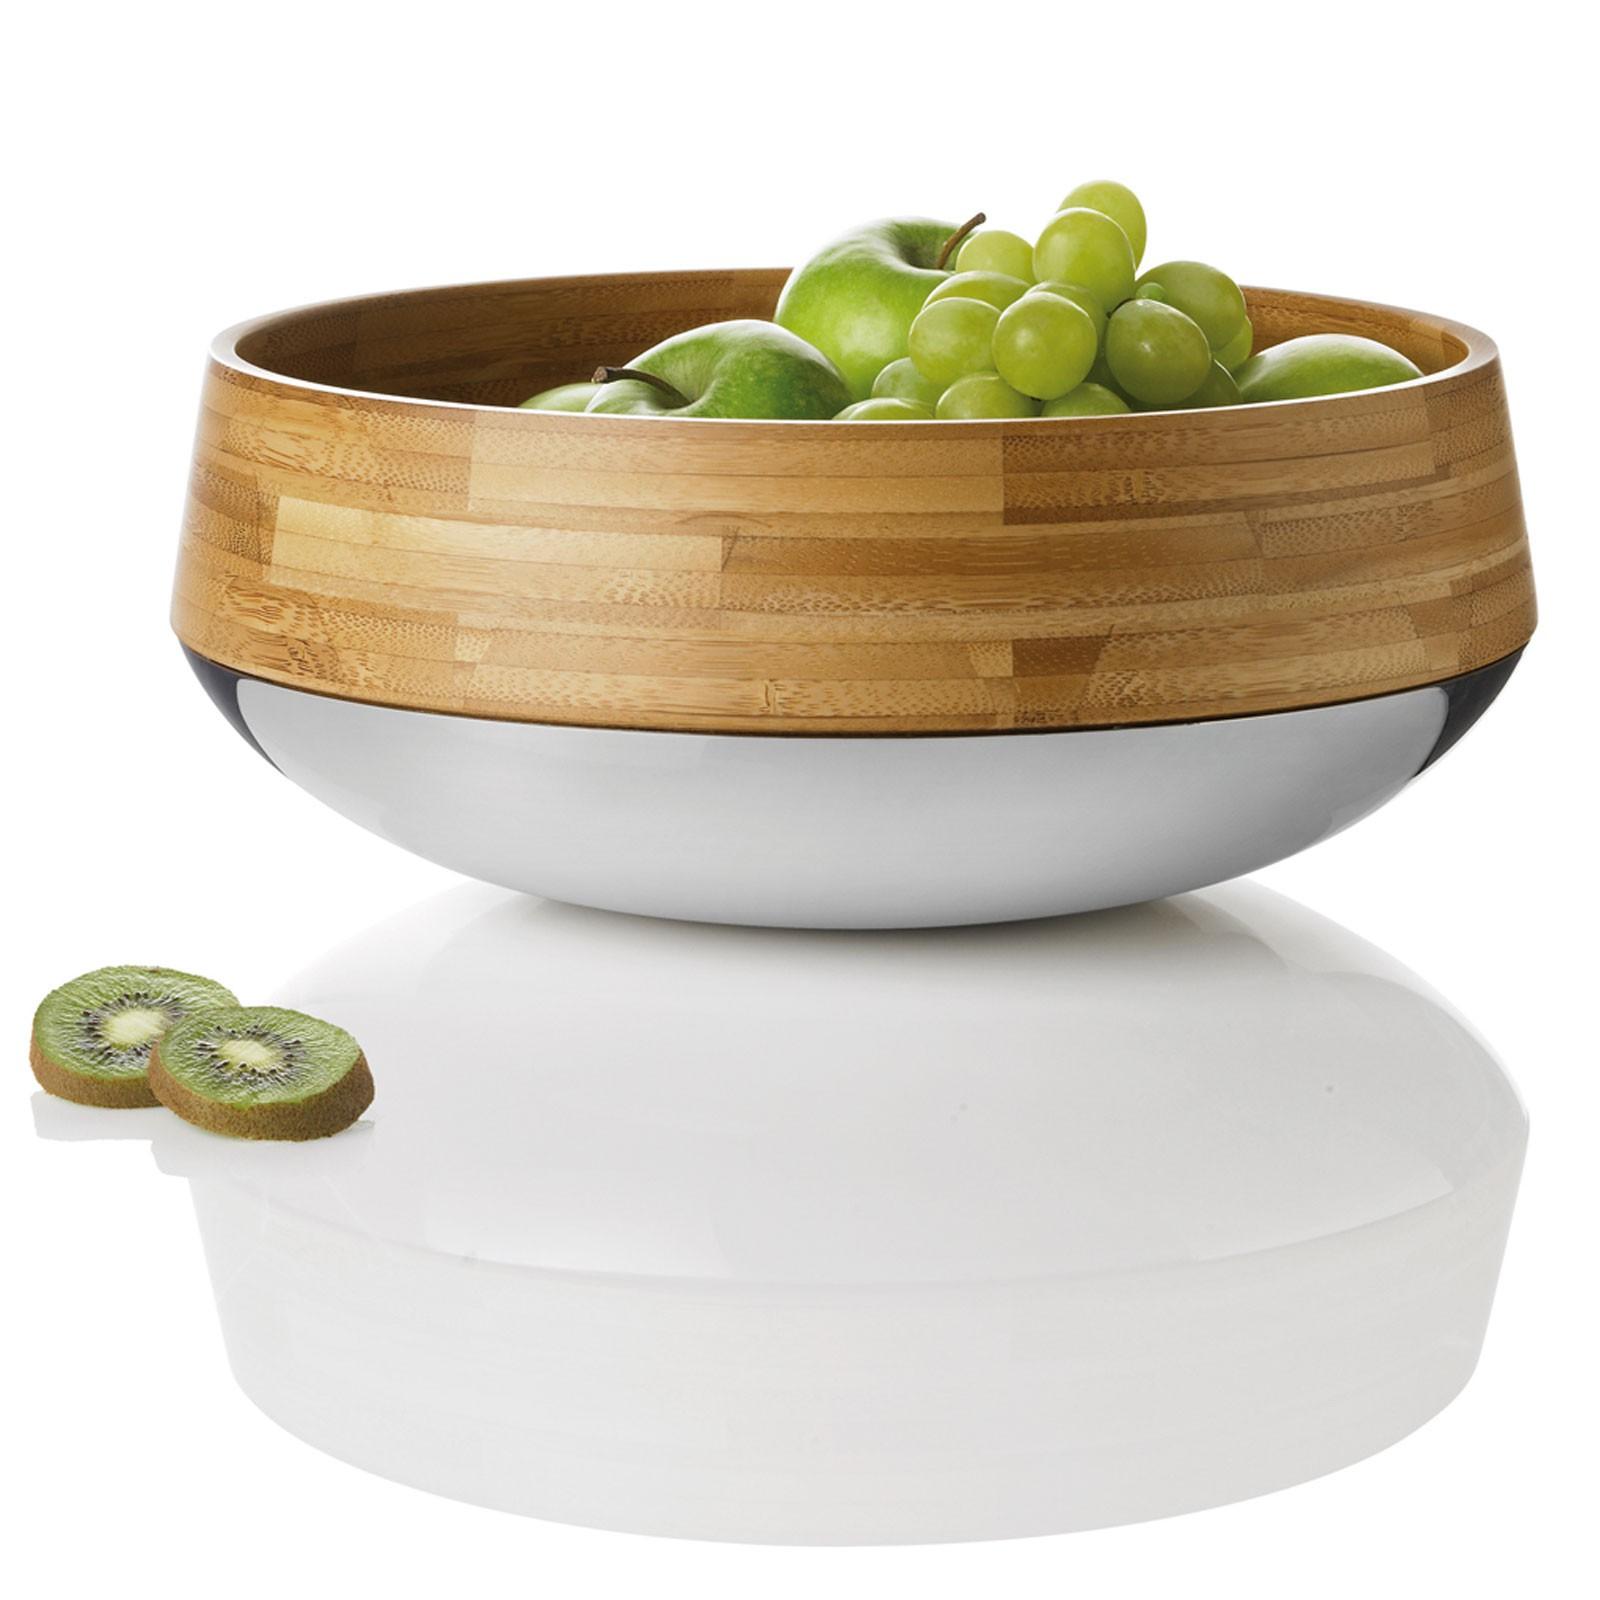 stelton Kontra Obst-/Salatschale Edelstahl Bambus